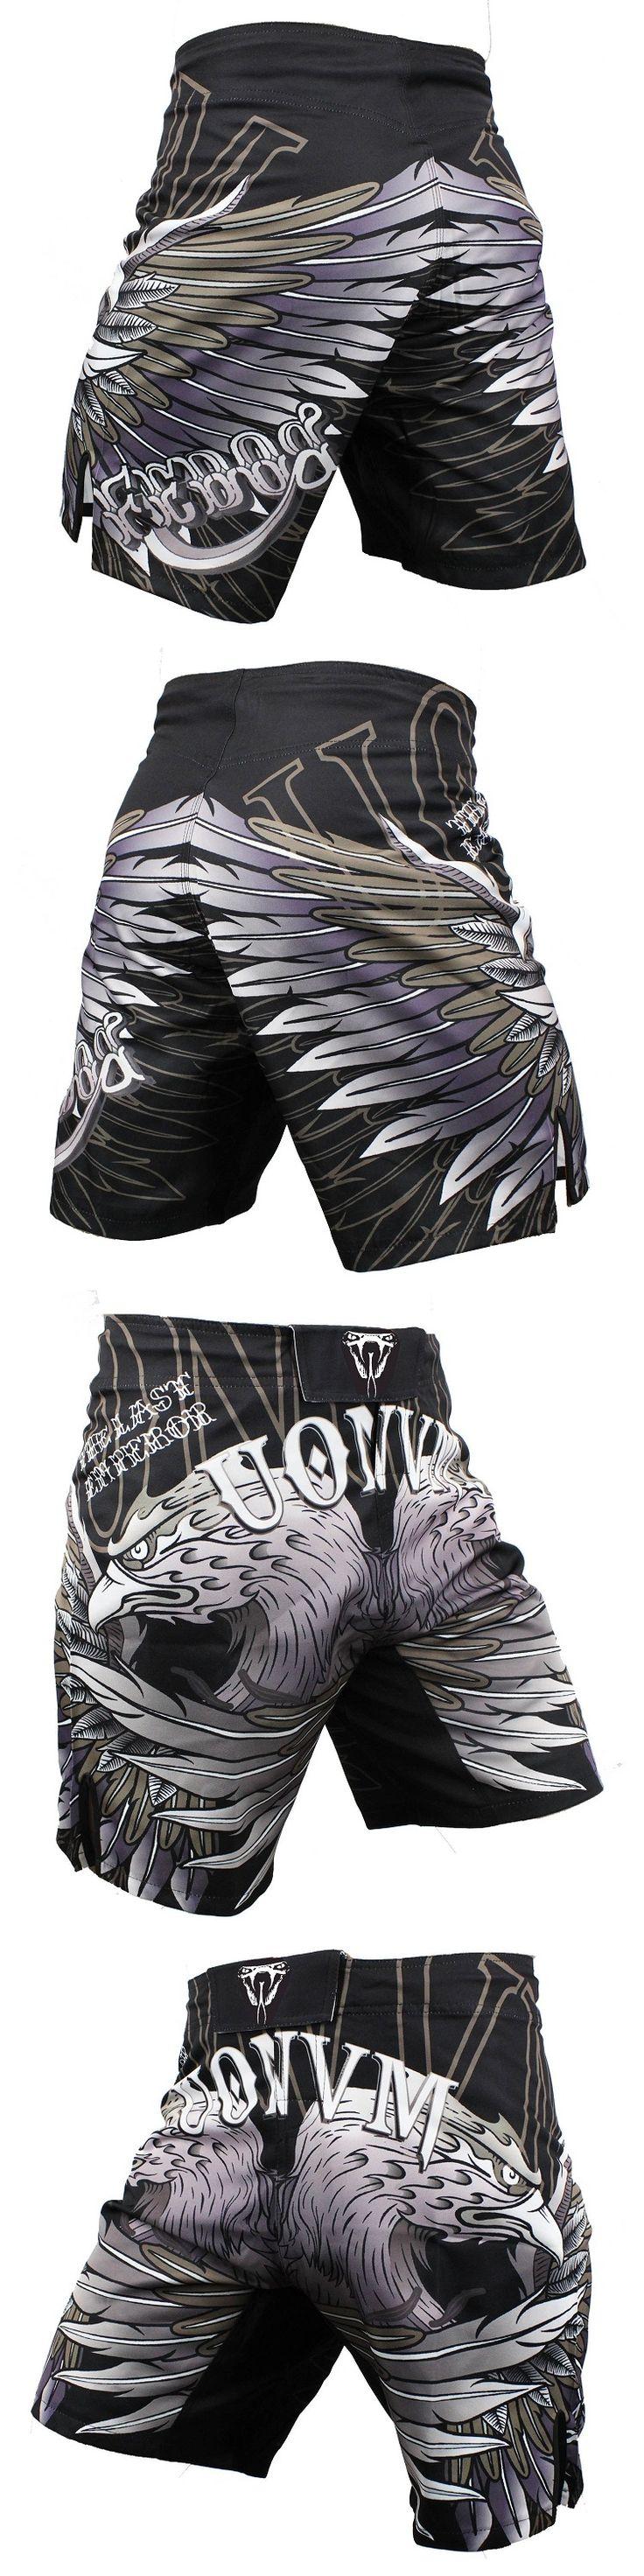 FEDOR SIGNATURE FIGHT MMA  Fitness Sanda fighting TIGER Muay Thai shorts boxer shorts Size S M L,XL